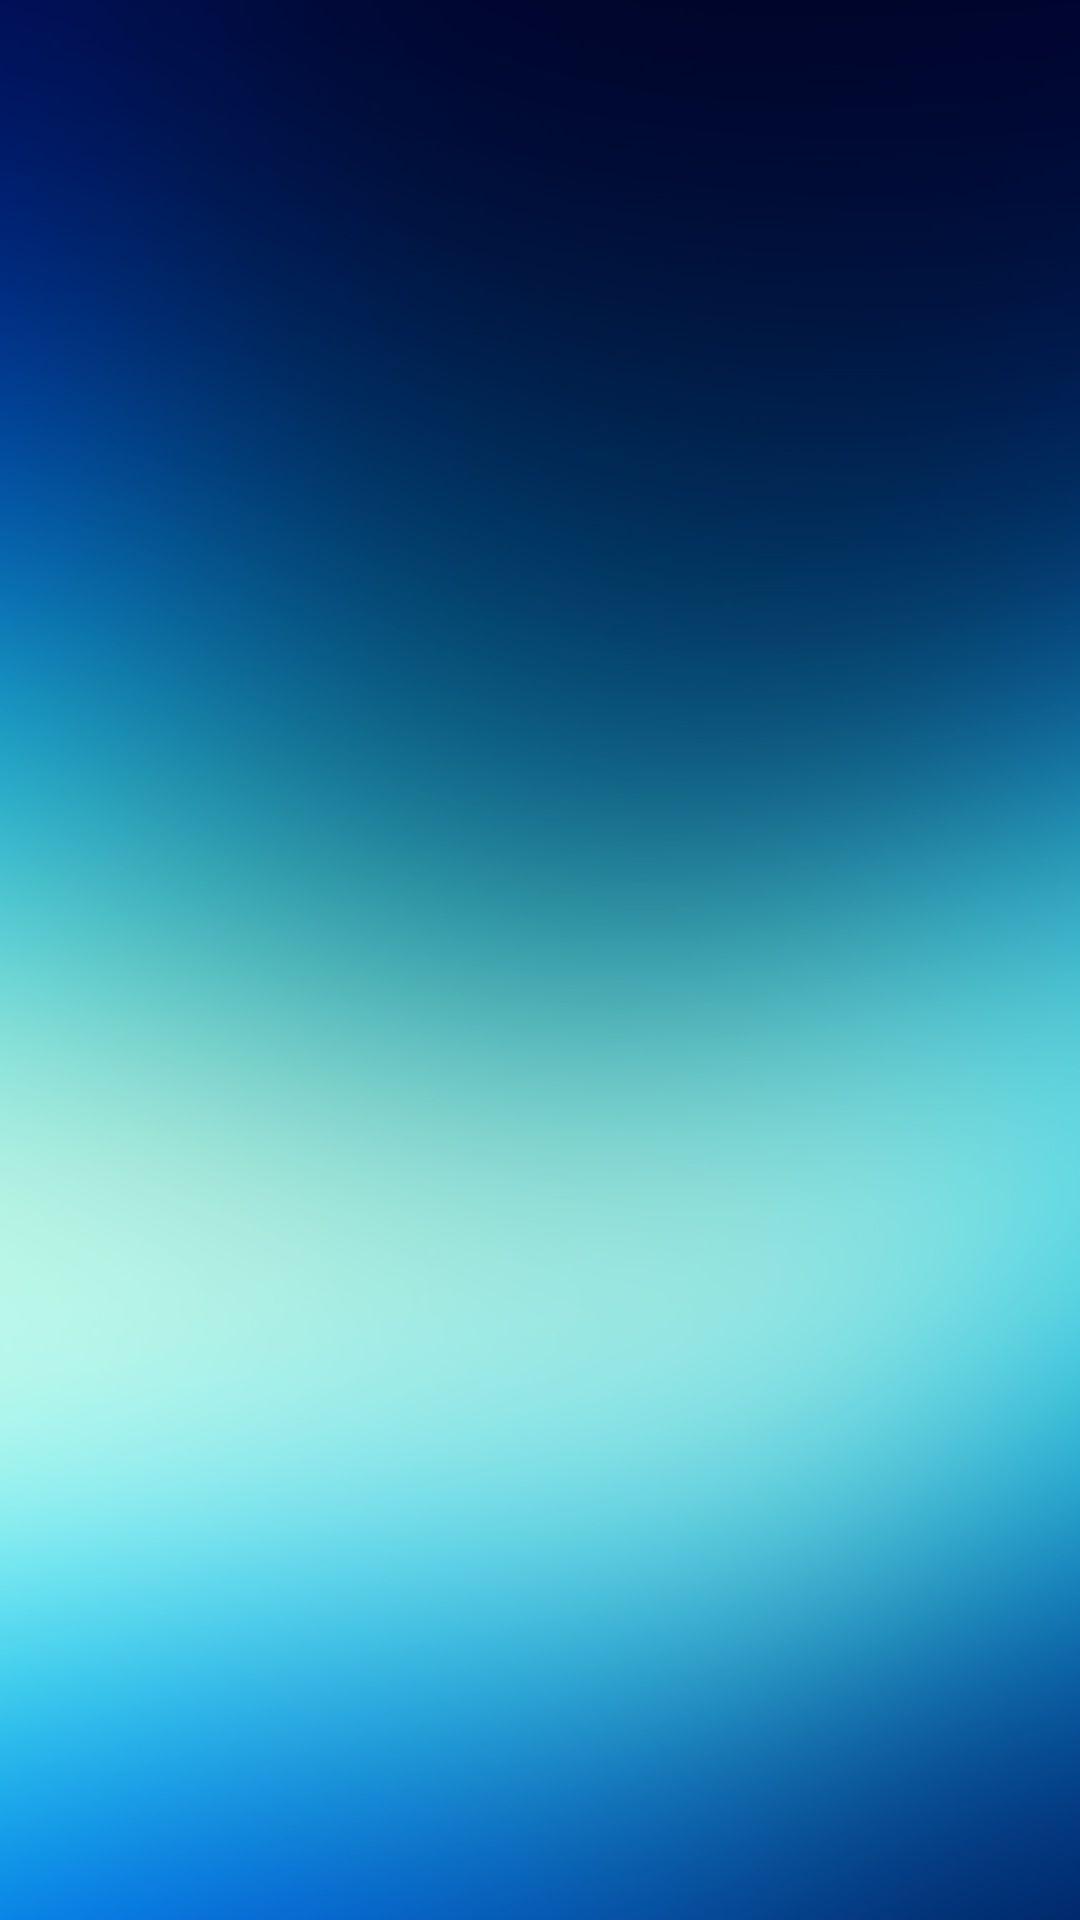 Blue Iphone 6 Wallpaper Ultra Hd Desktop And Mobile Wallpaper